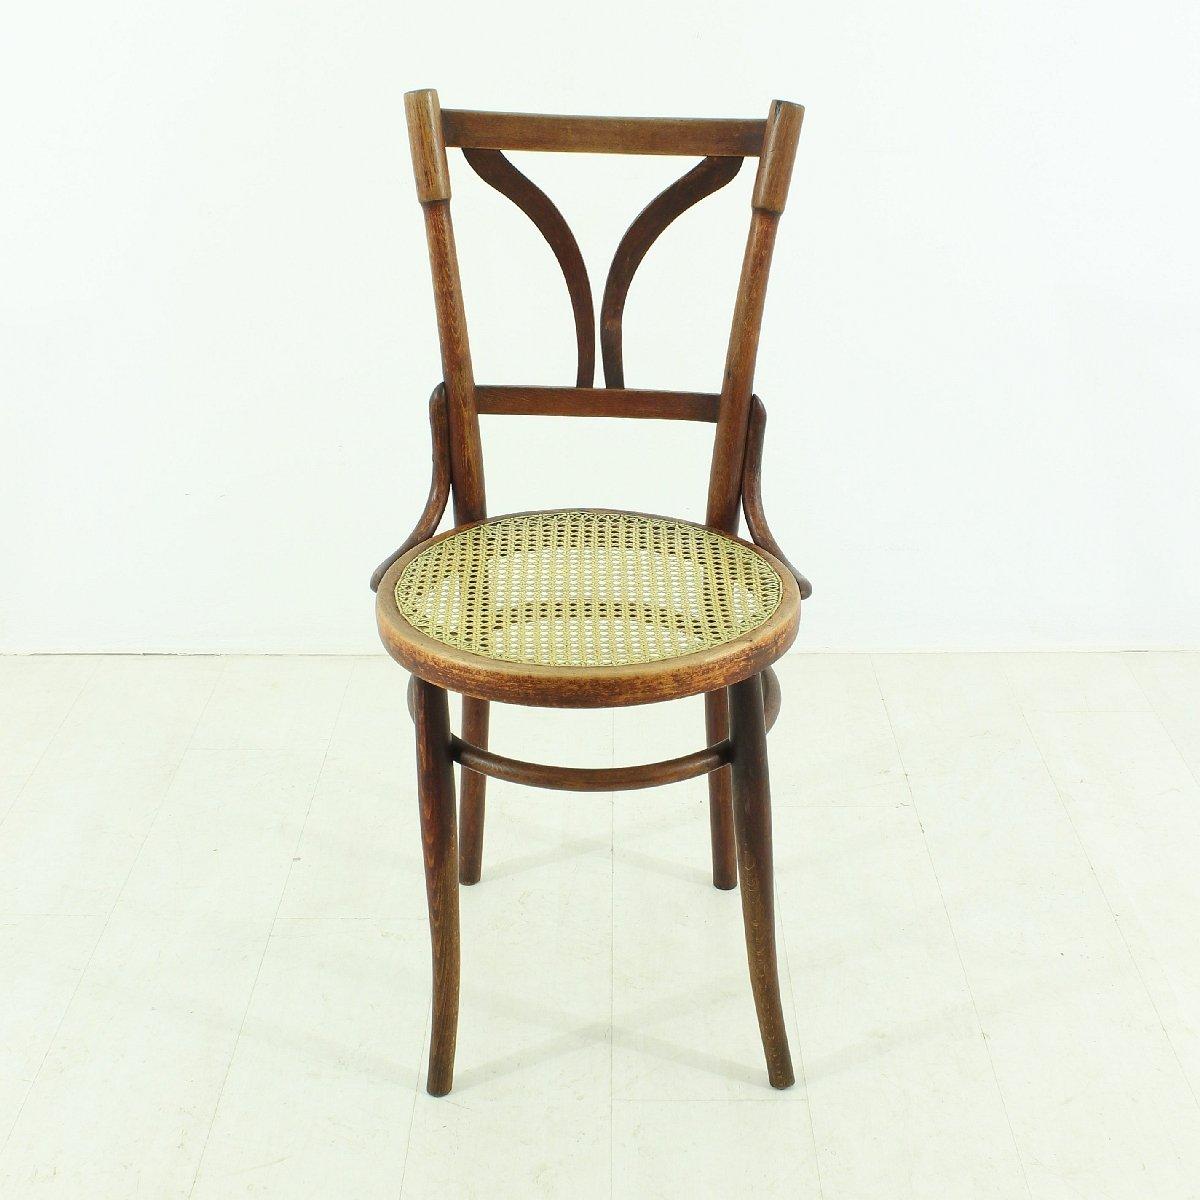 Bentwood bistro chair - Antique Bentwood Bistro Chairs Set Of 2